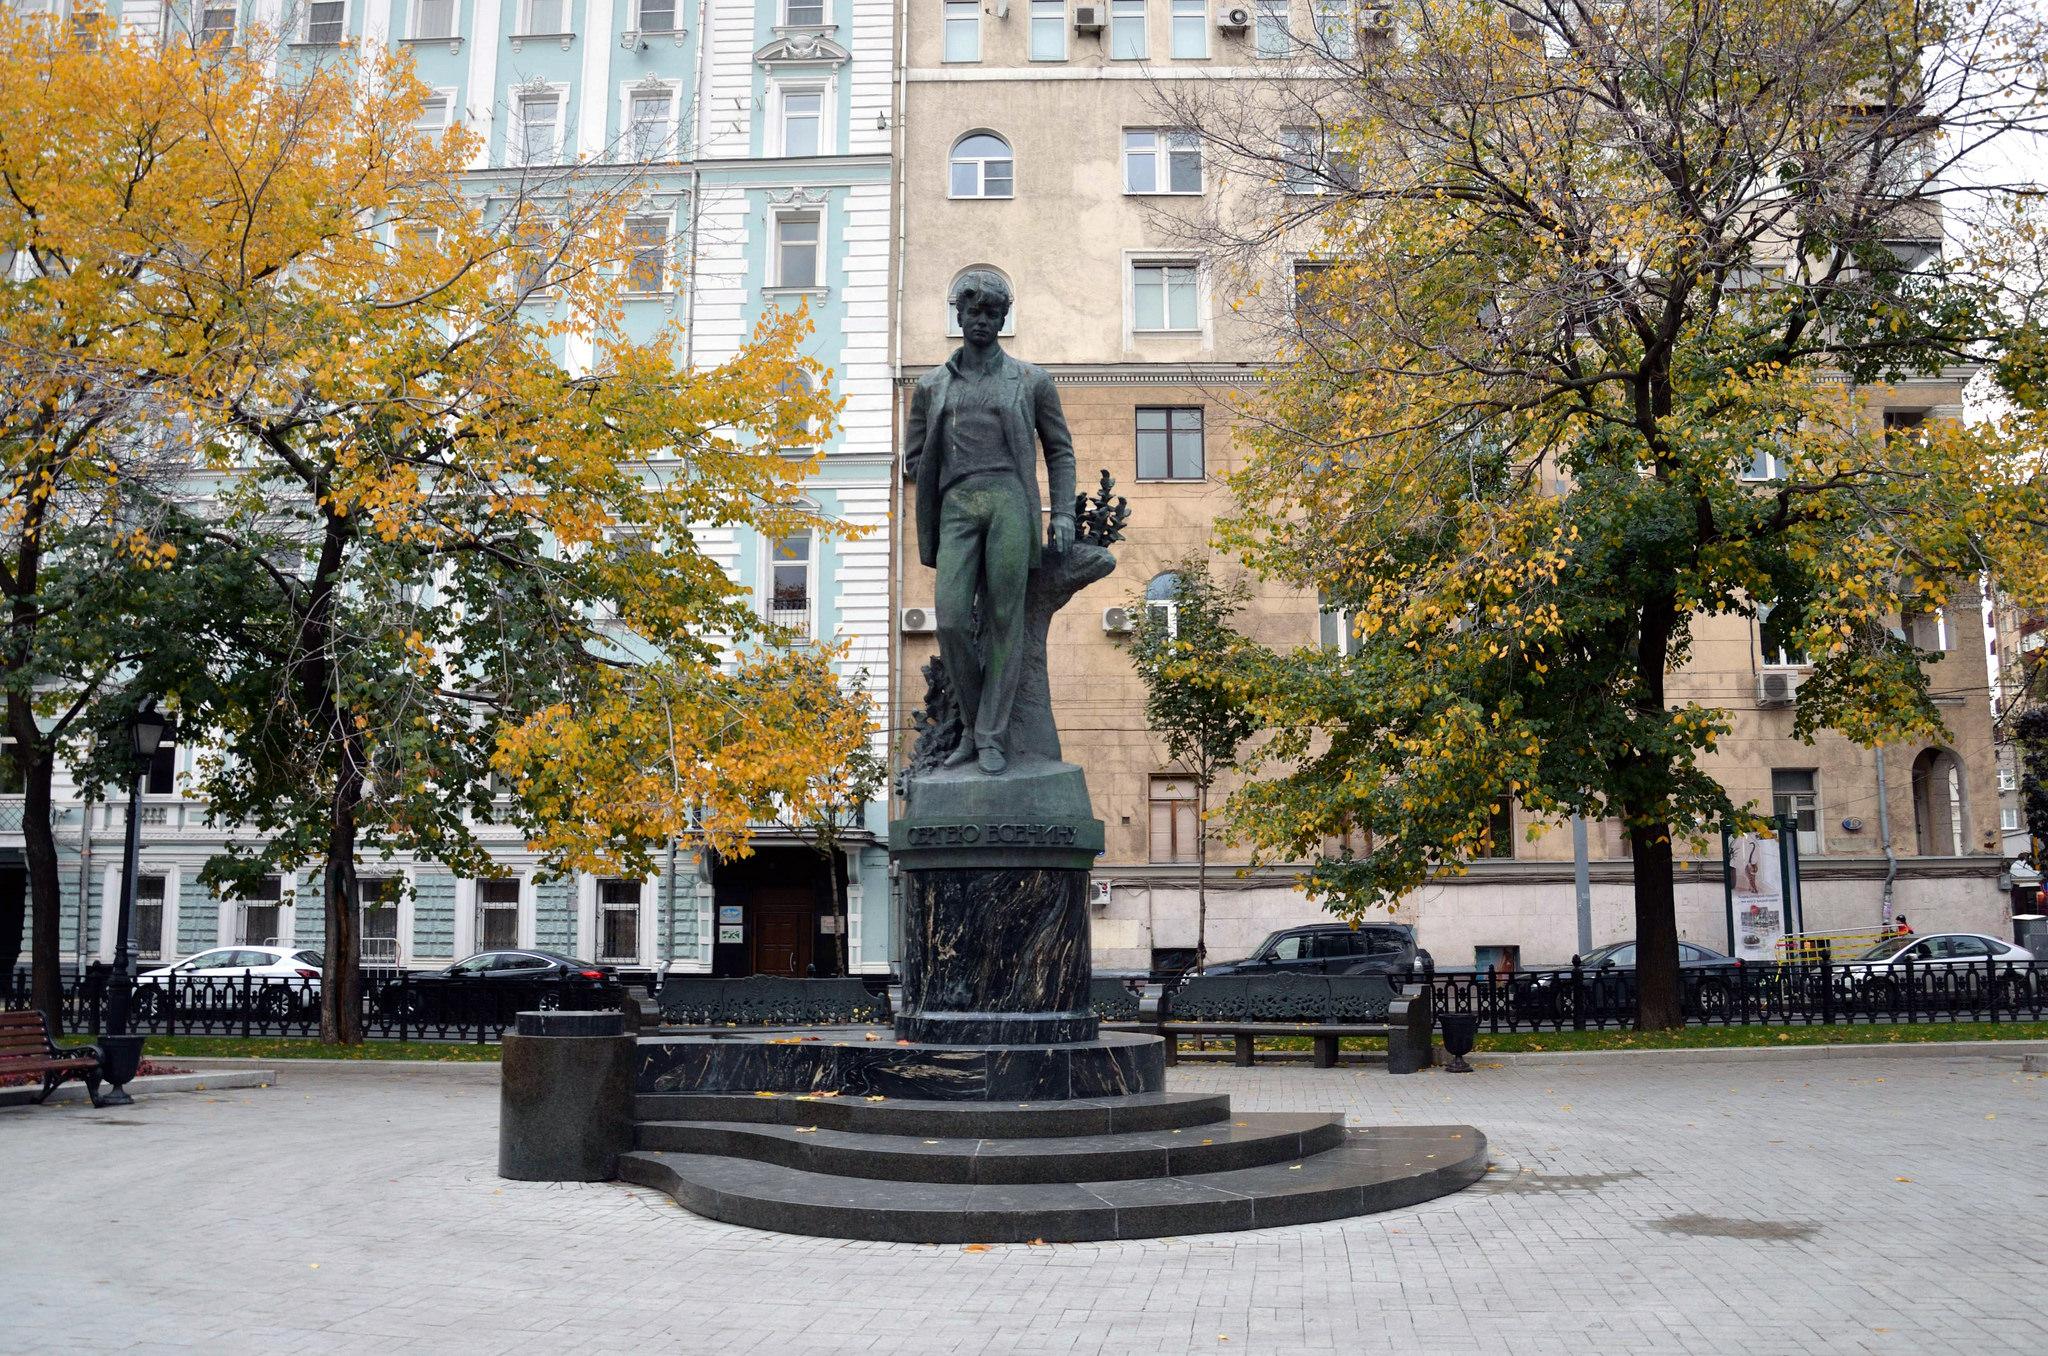 цена на памятники ярославль 2018